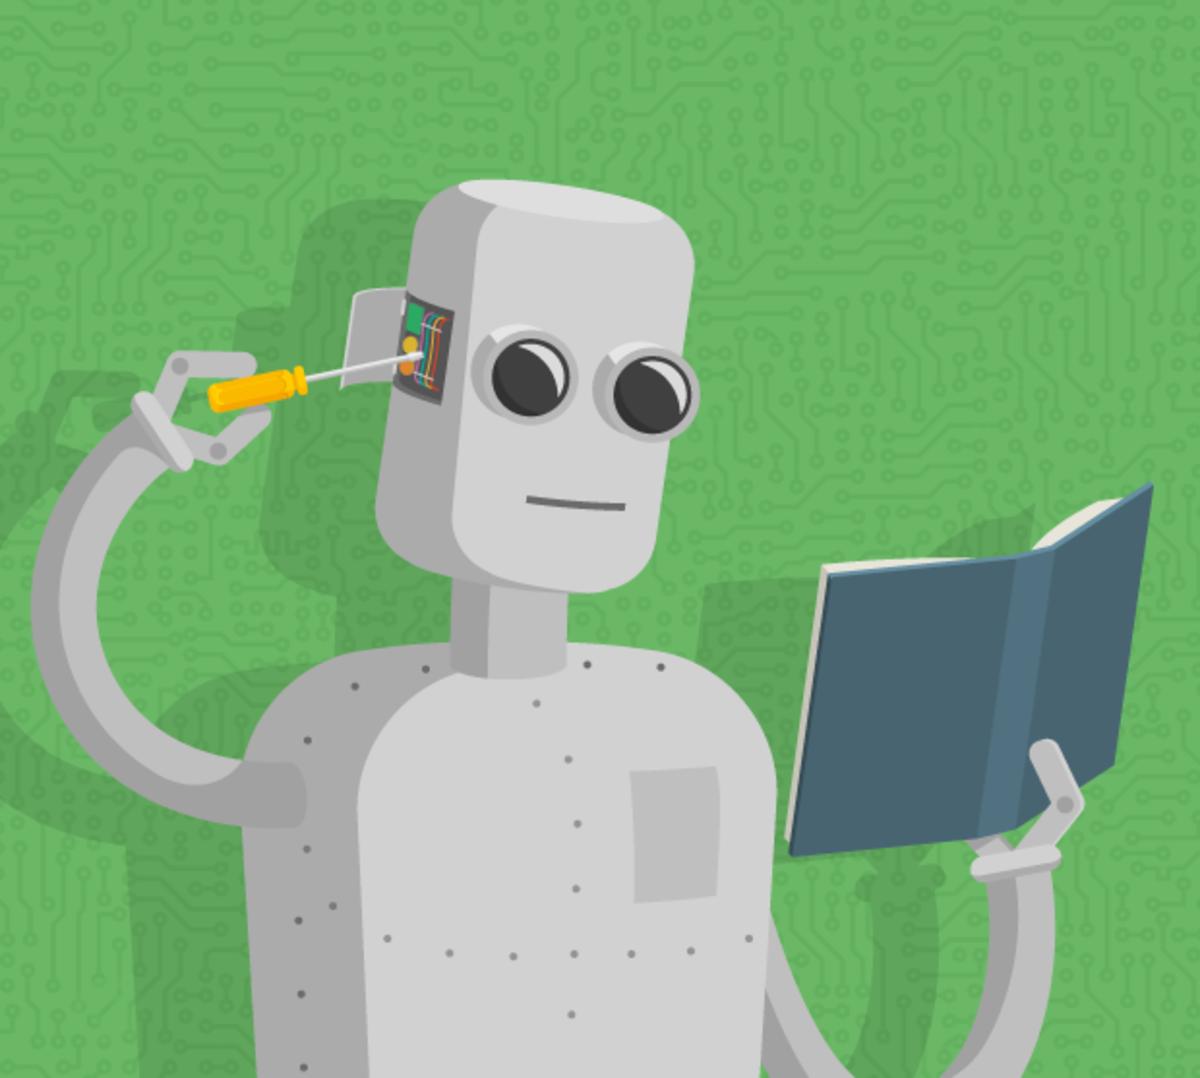 machine tweaking itself : machine learning